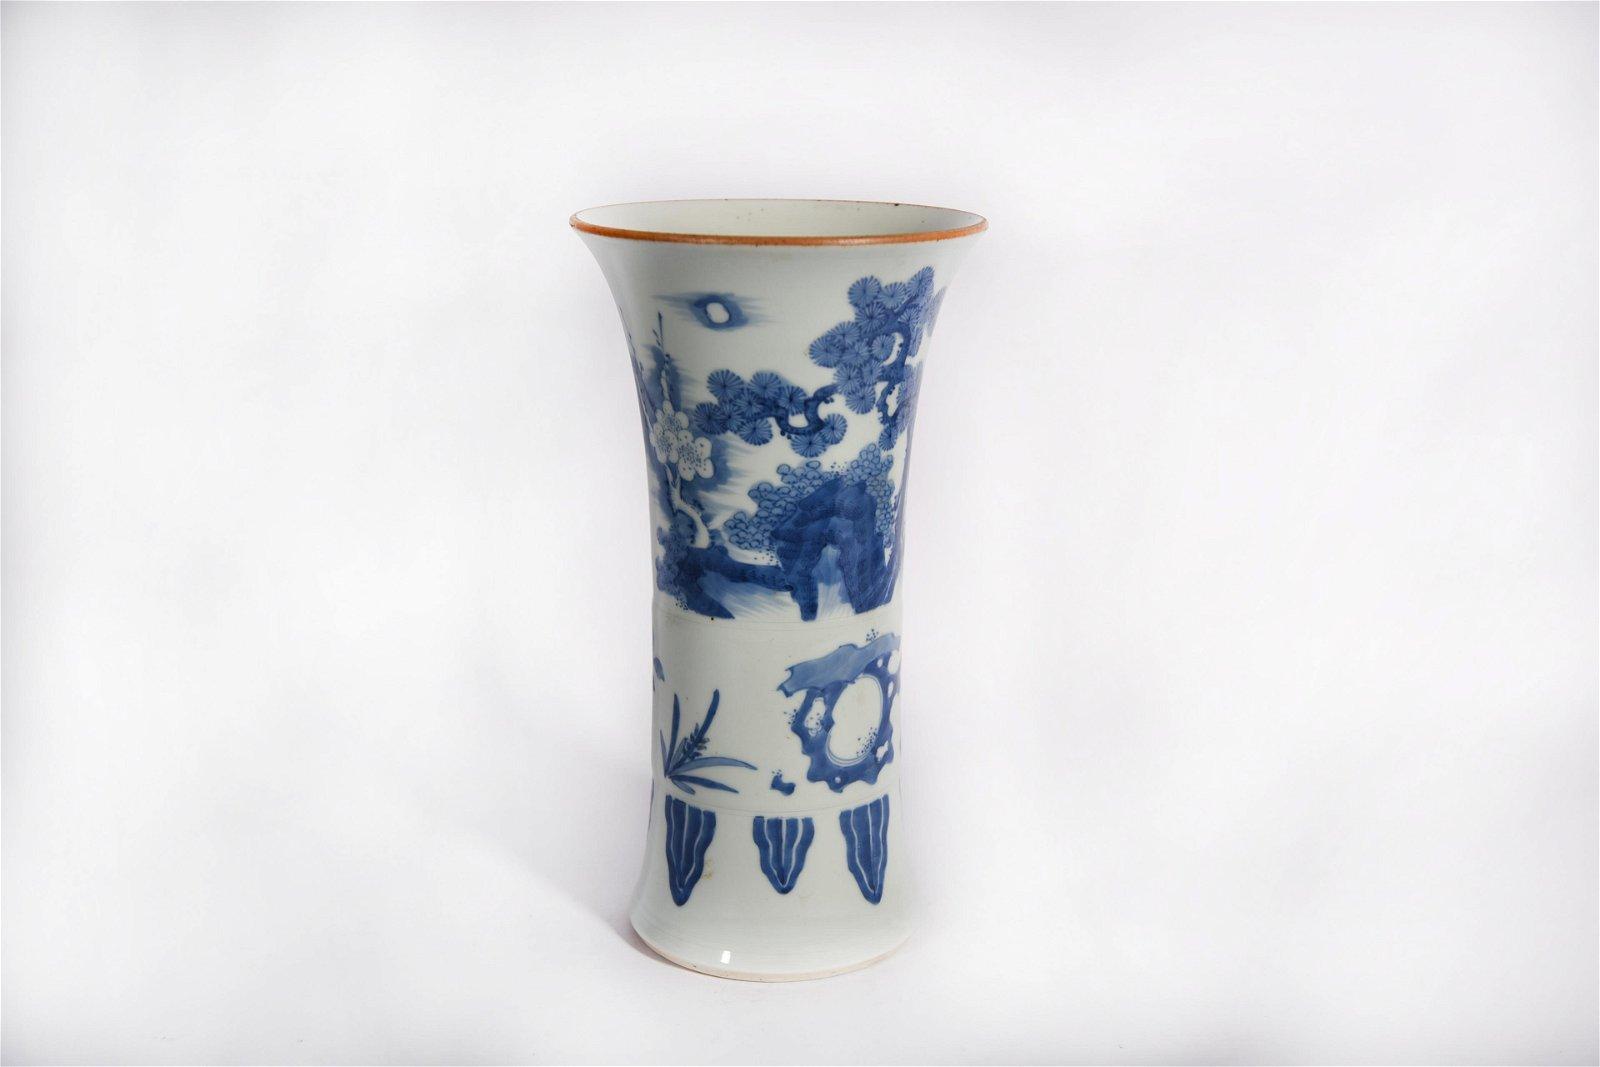 A Blue and White Beaker Vase Shunzhi Period